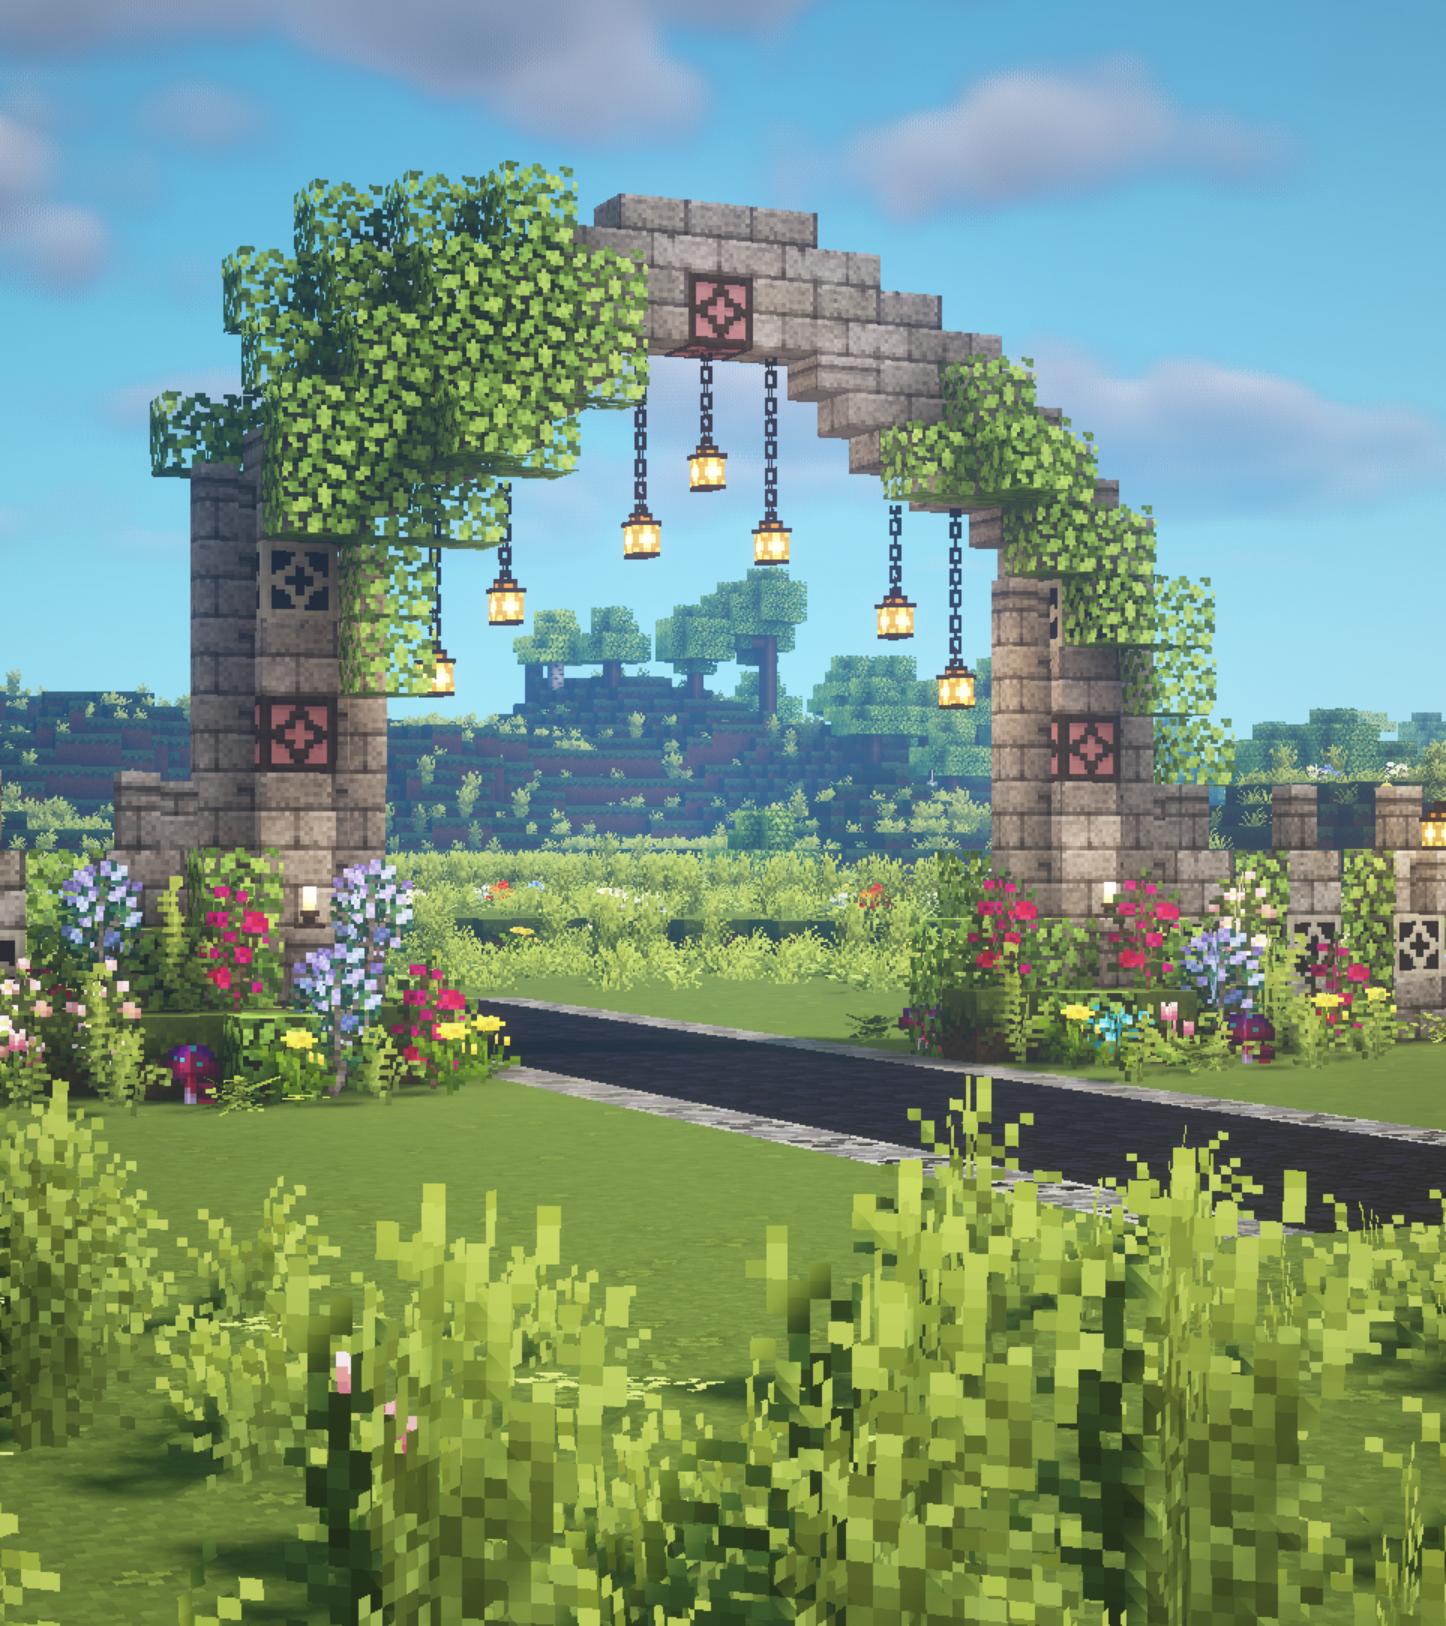 Fairy Arch Aesthetic Minecraft Tutorial 🍄🌿✨ Fairyt